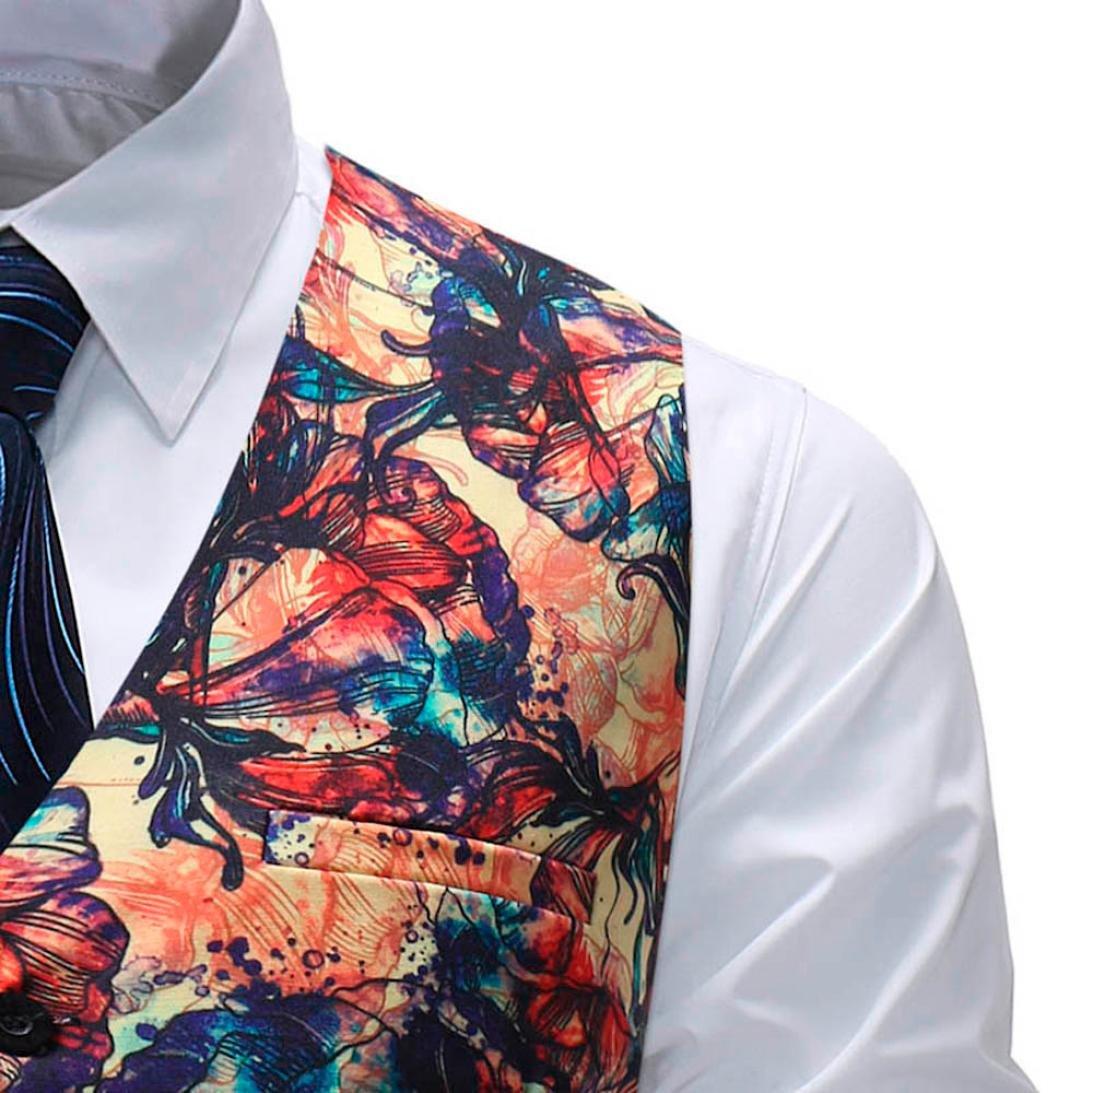 Easytoy Mens Formal Business Dress Suit Waistcoat Vests Slim Fit Button Down TuxedoVests